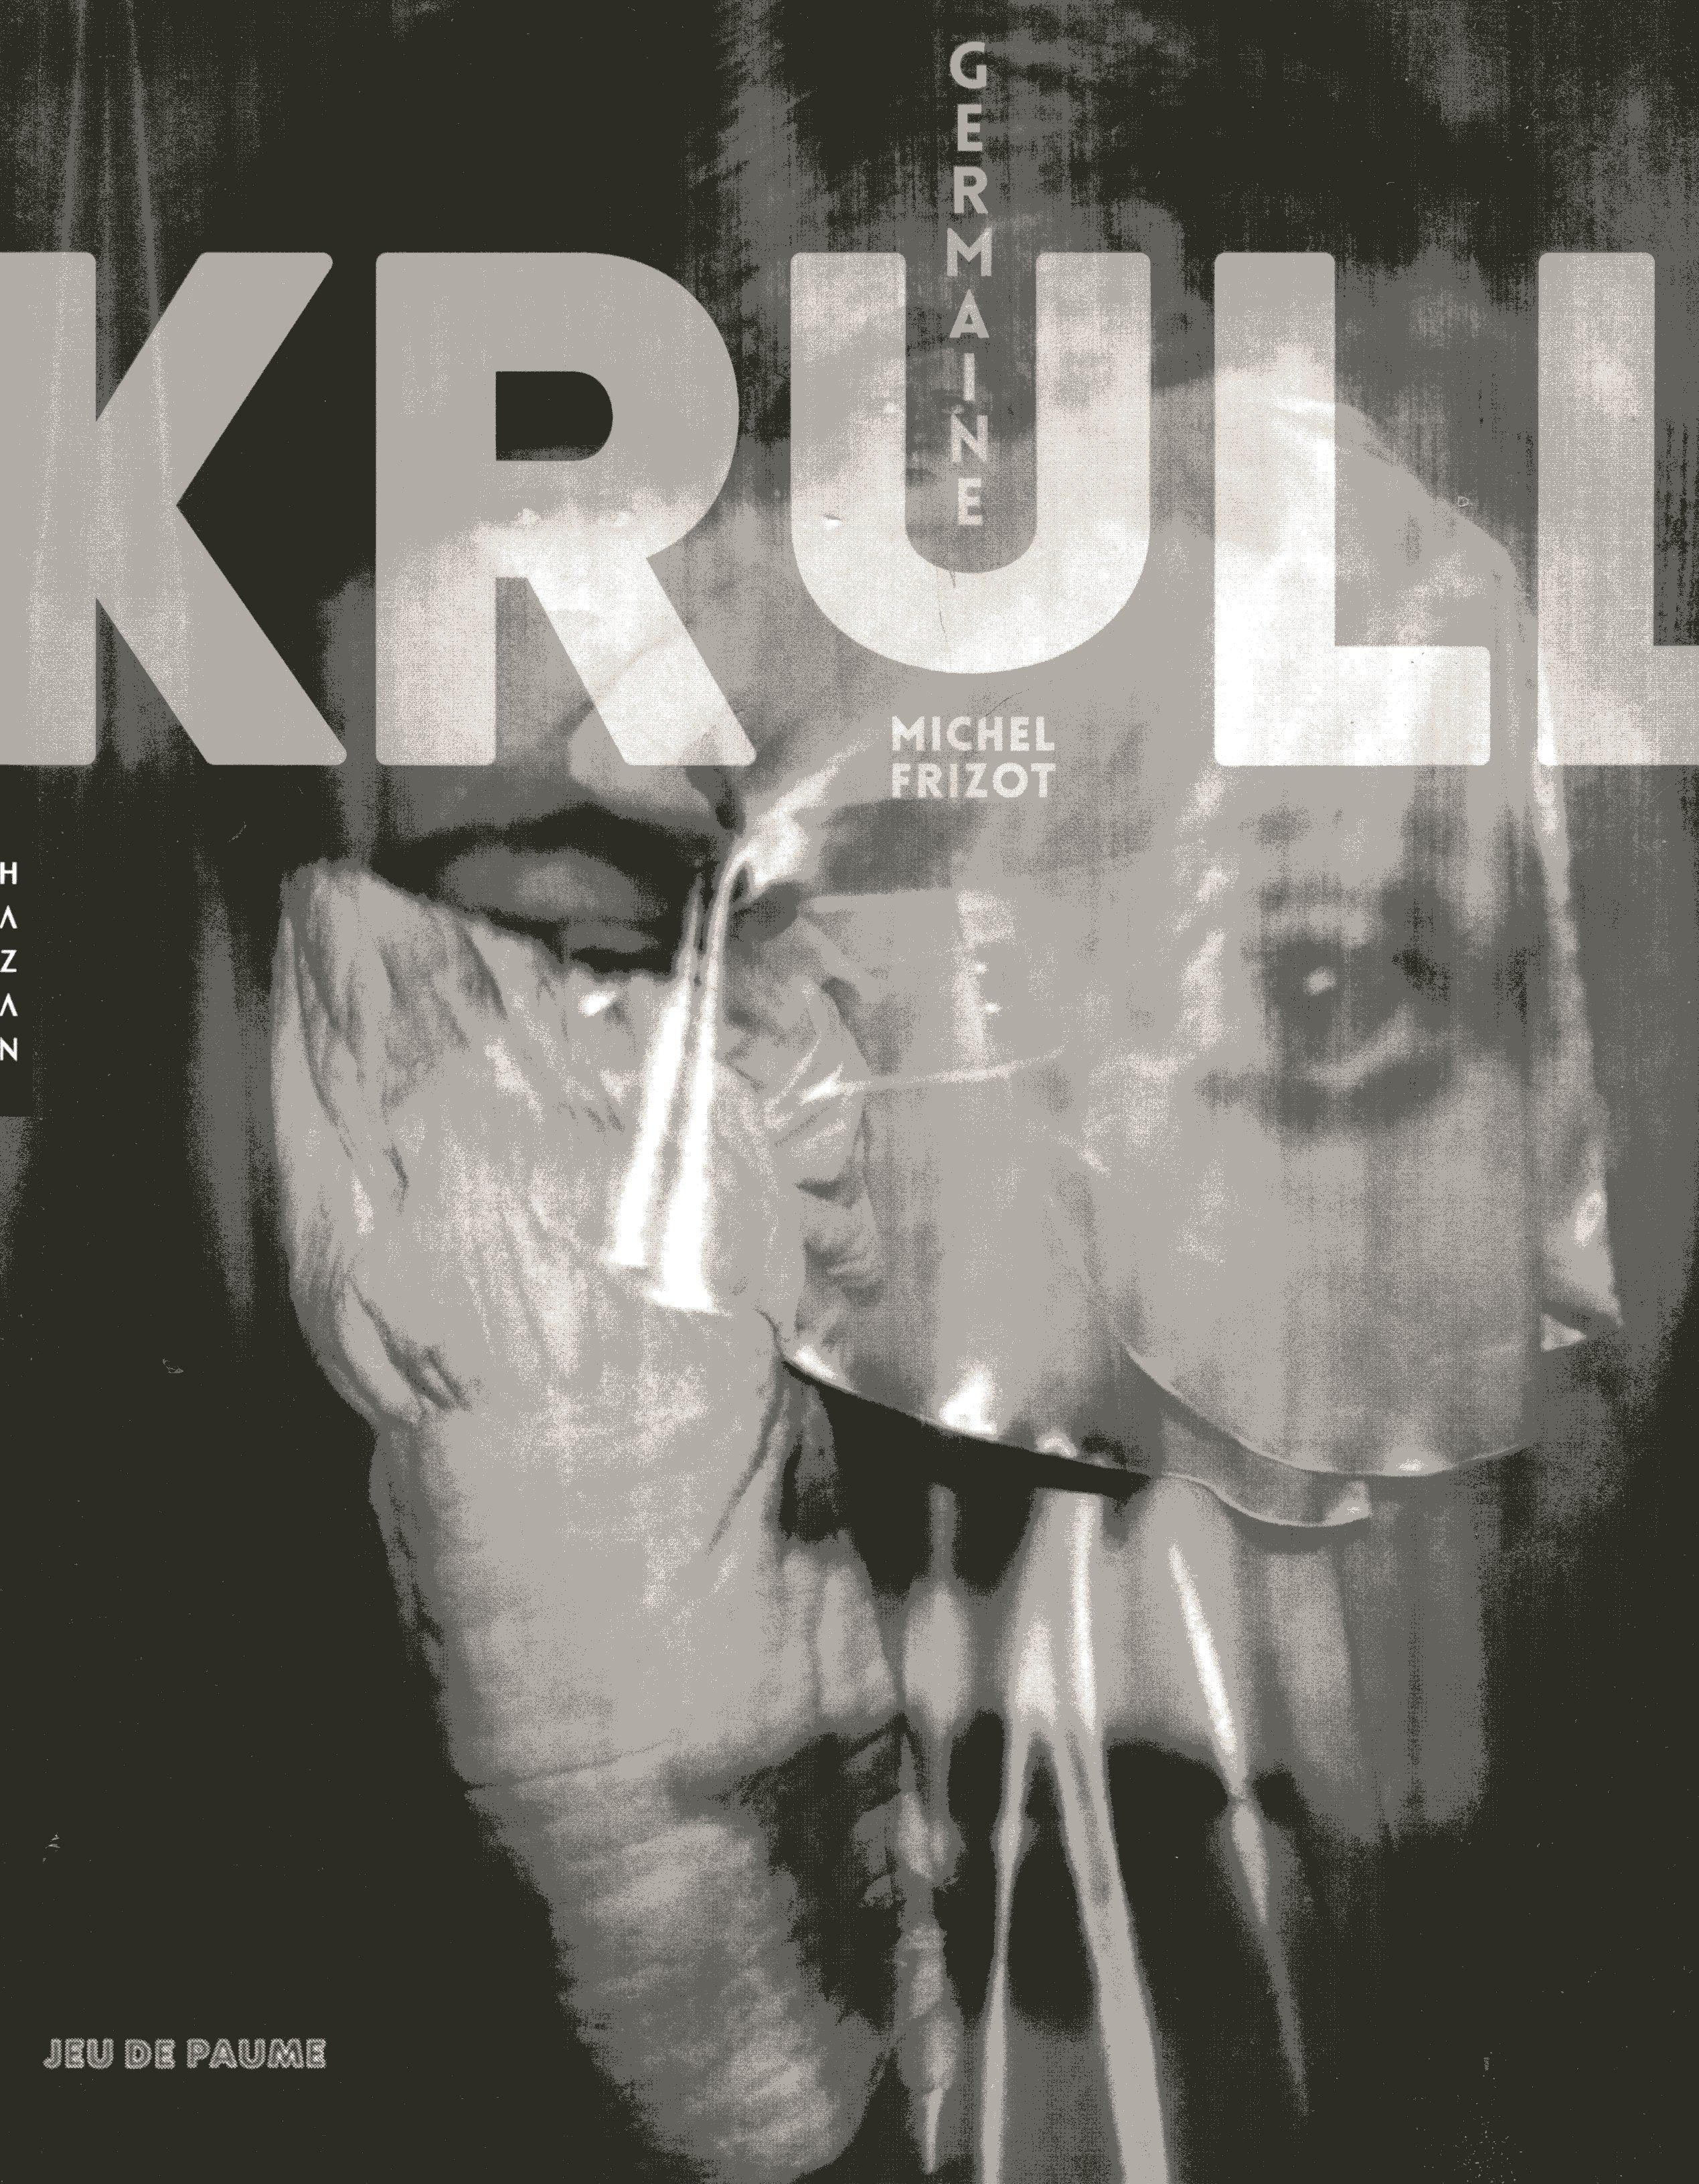 GERMAINE KRULL (ENGLISH VERSION)